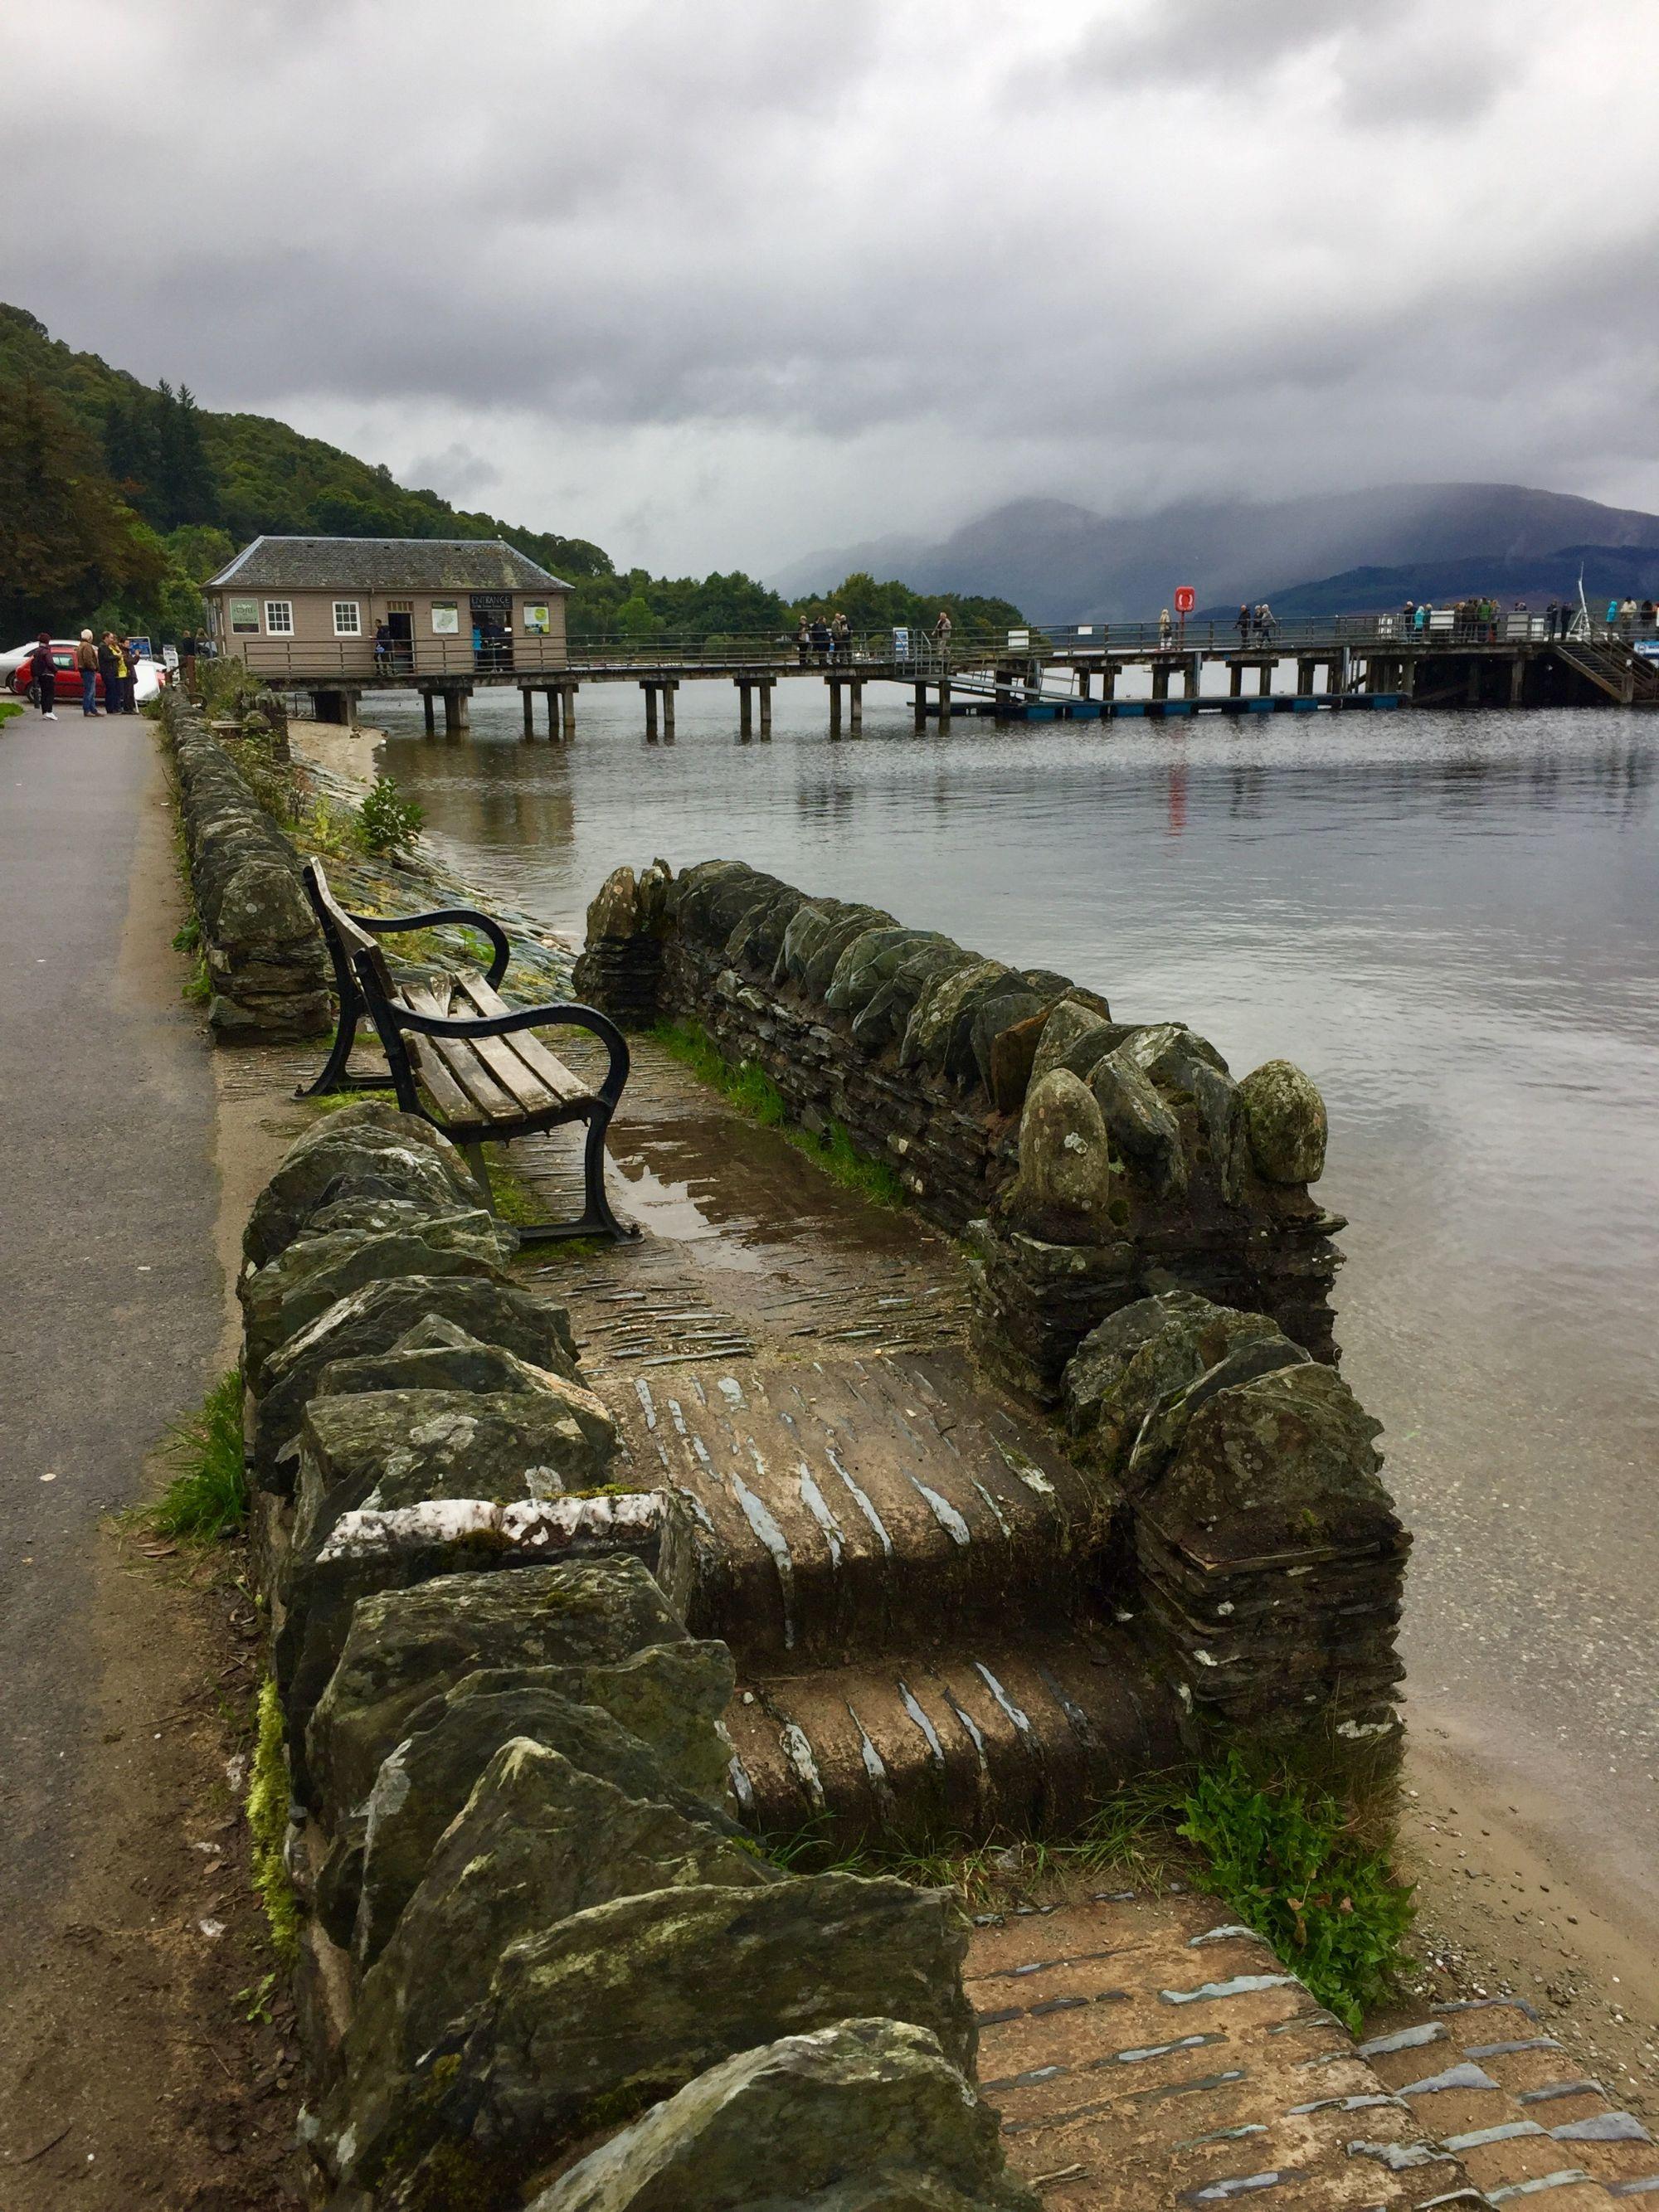 Luss and Loch Lomond